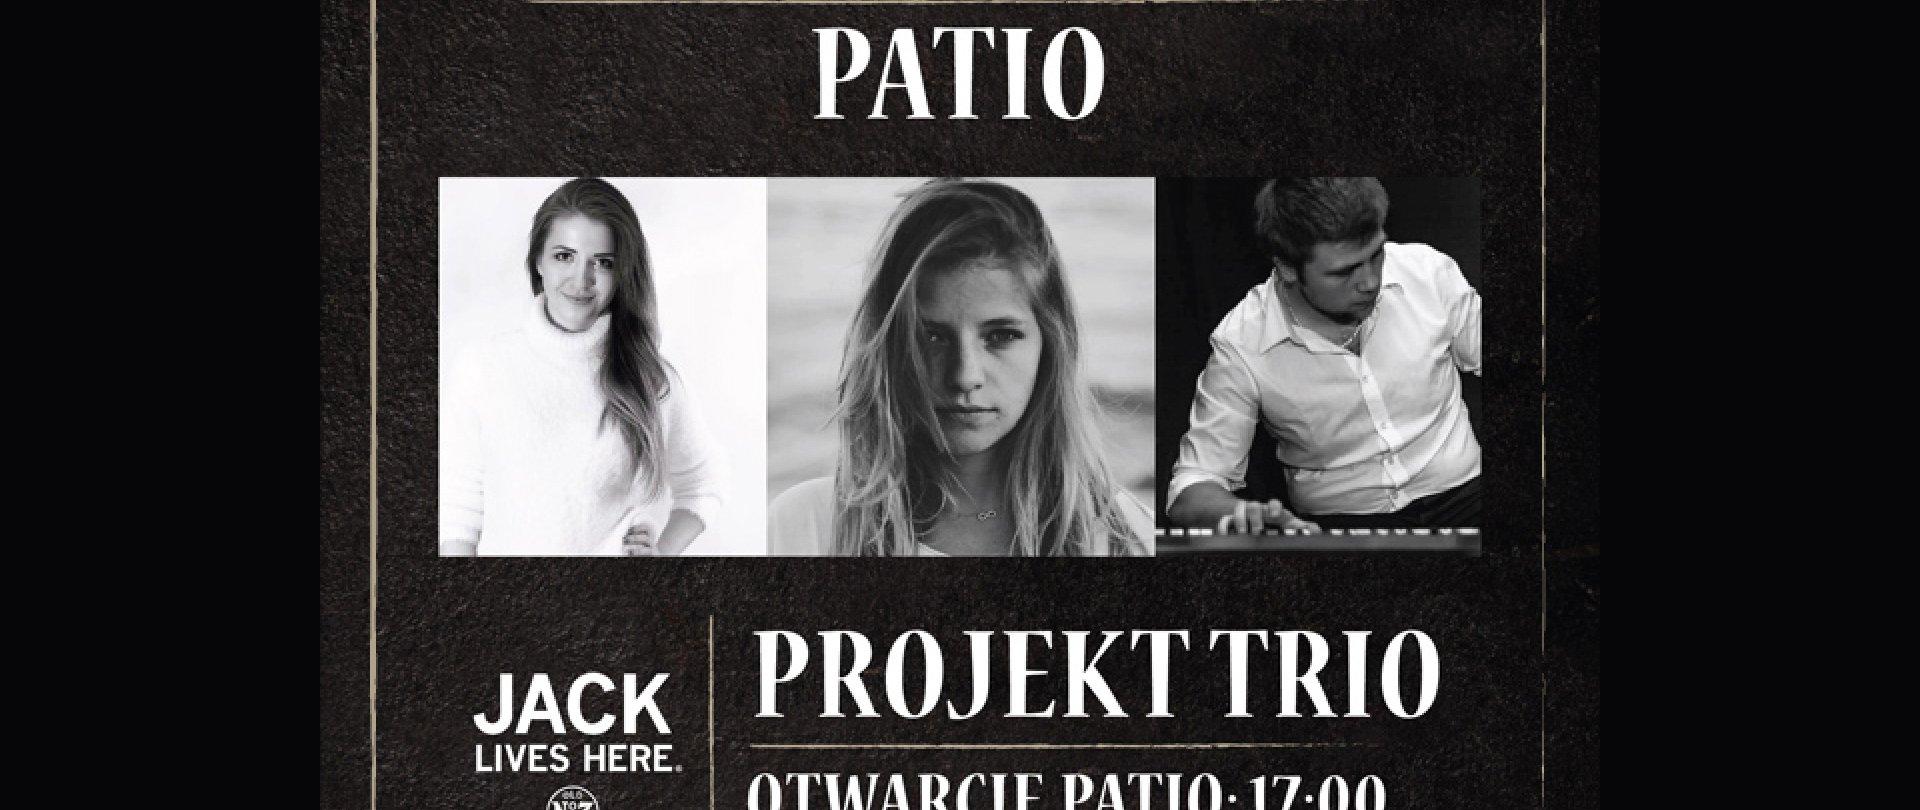 Projekt Trio - JLH Patio Lord Jack